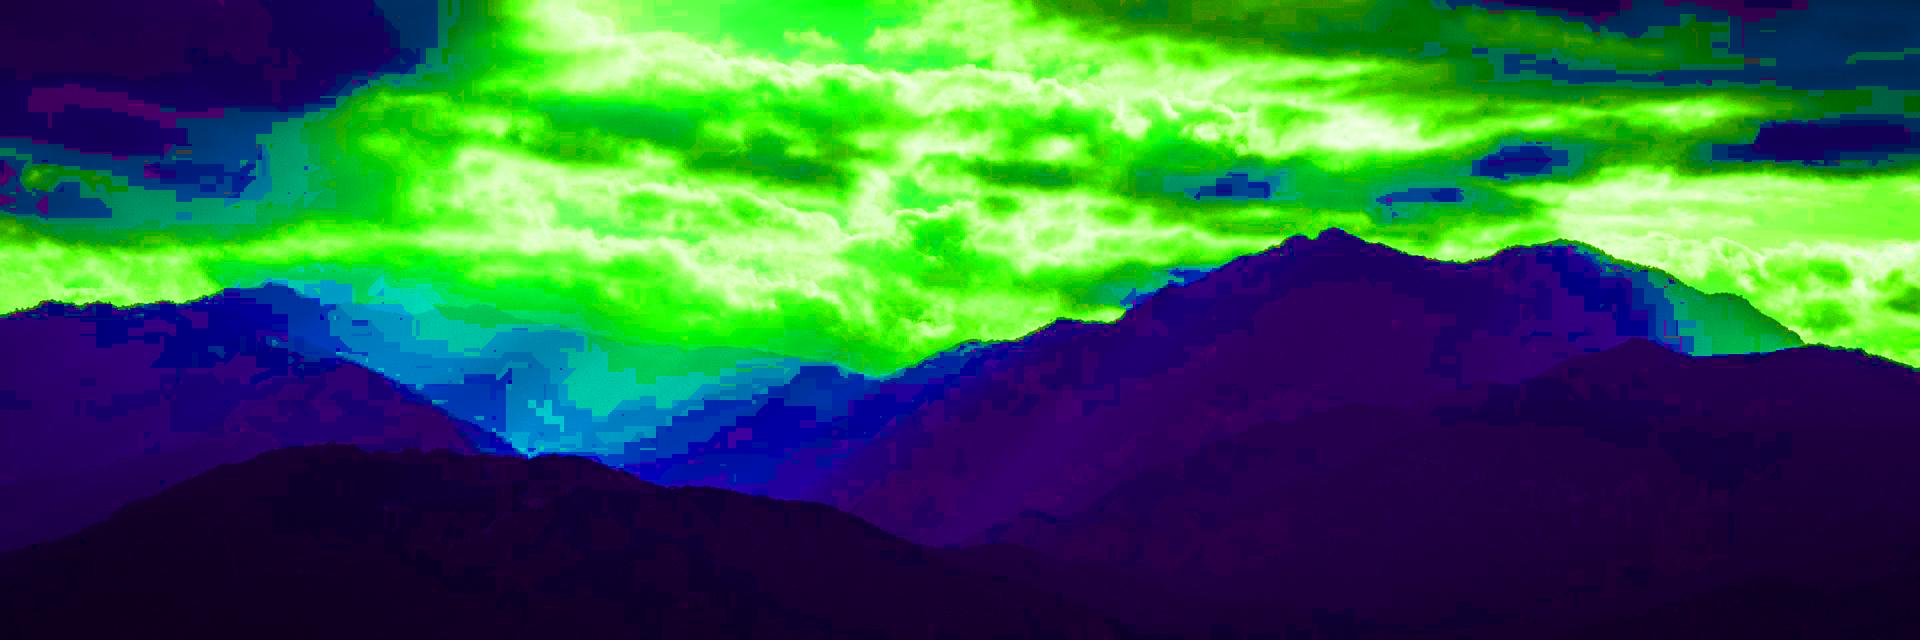 mountains-3534373_1920.jpg